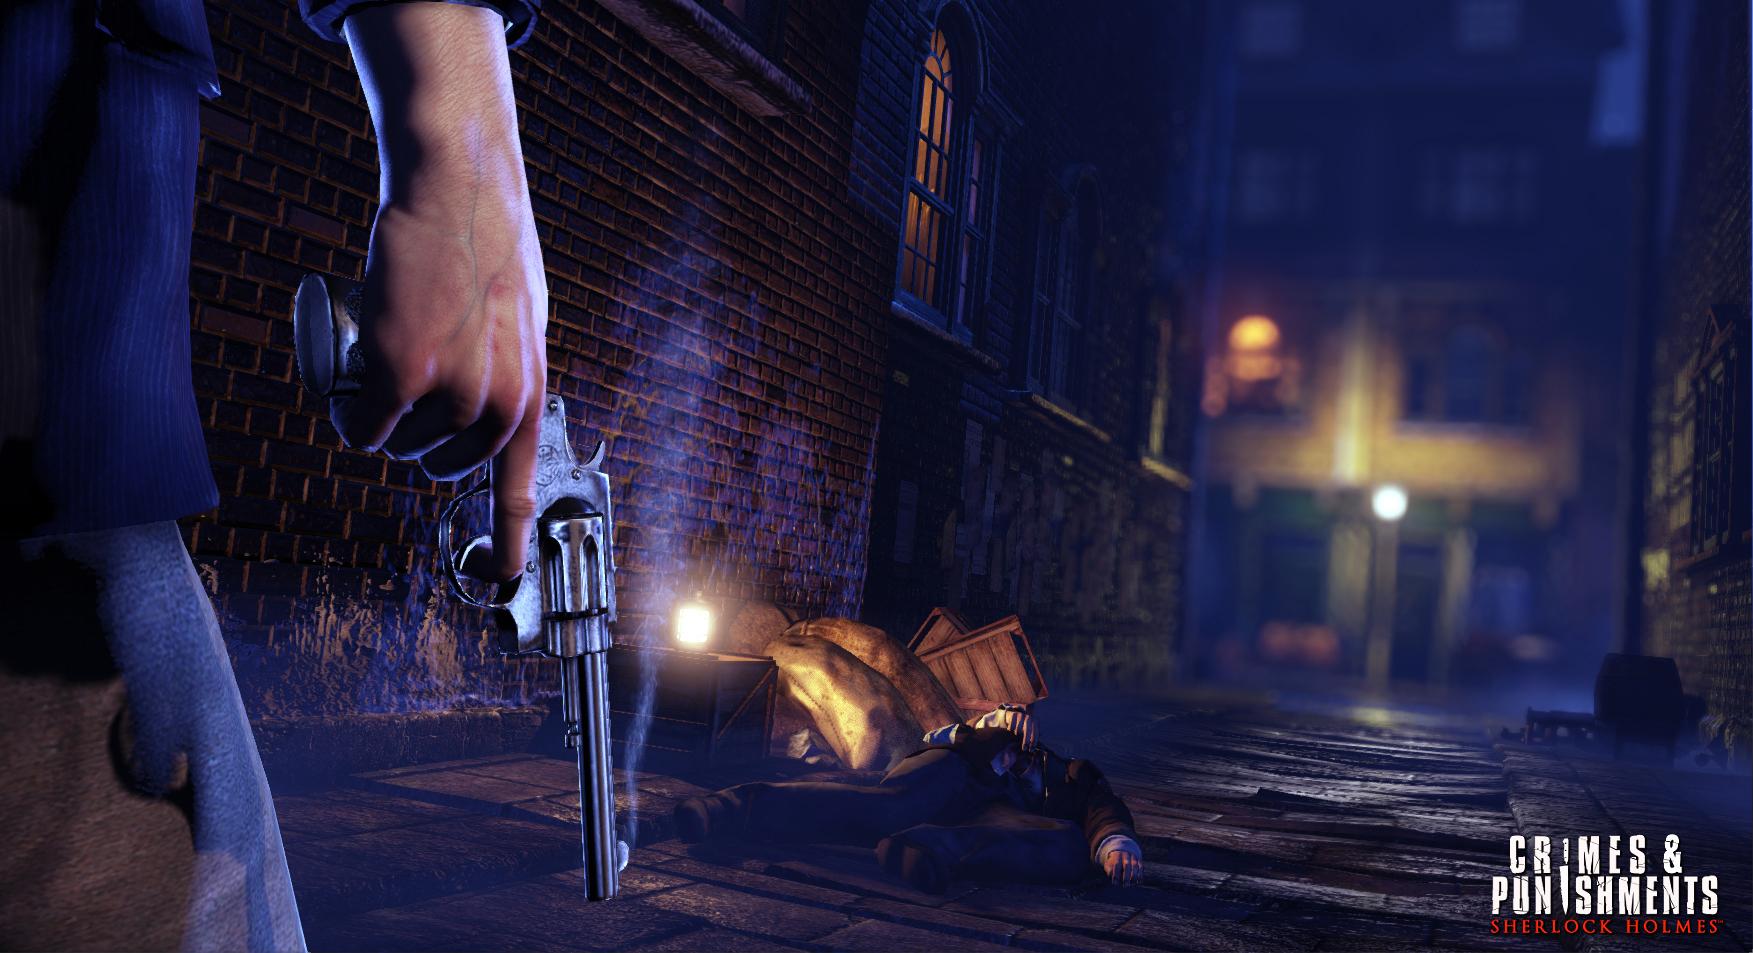 New_crimes&punishments-13